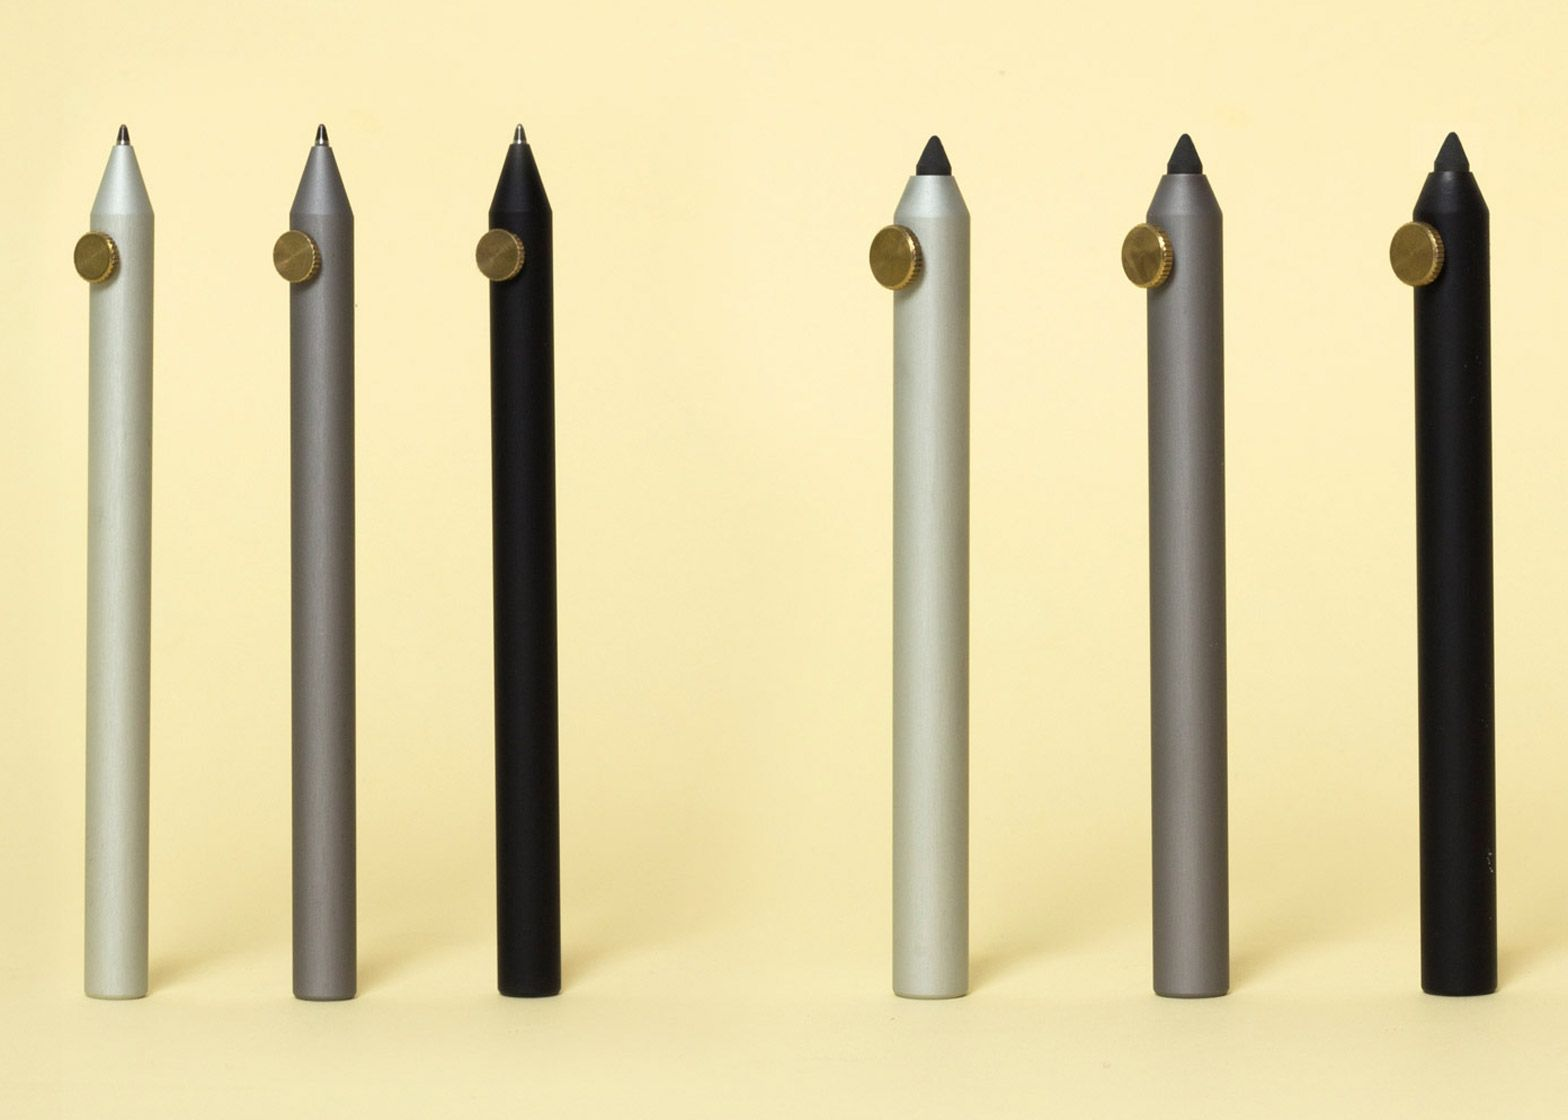 Neri_pens-and-pencils_Internoitaliano_dezeen_1568_0